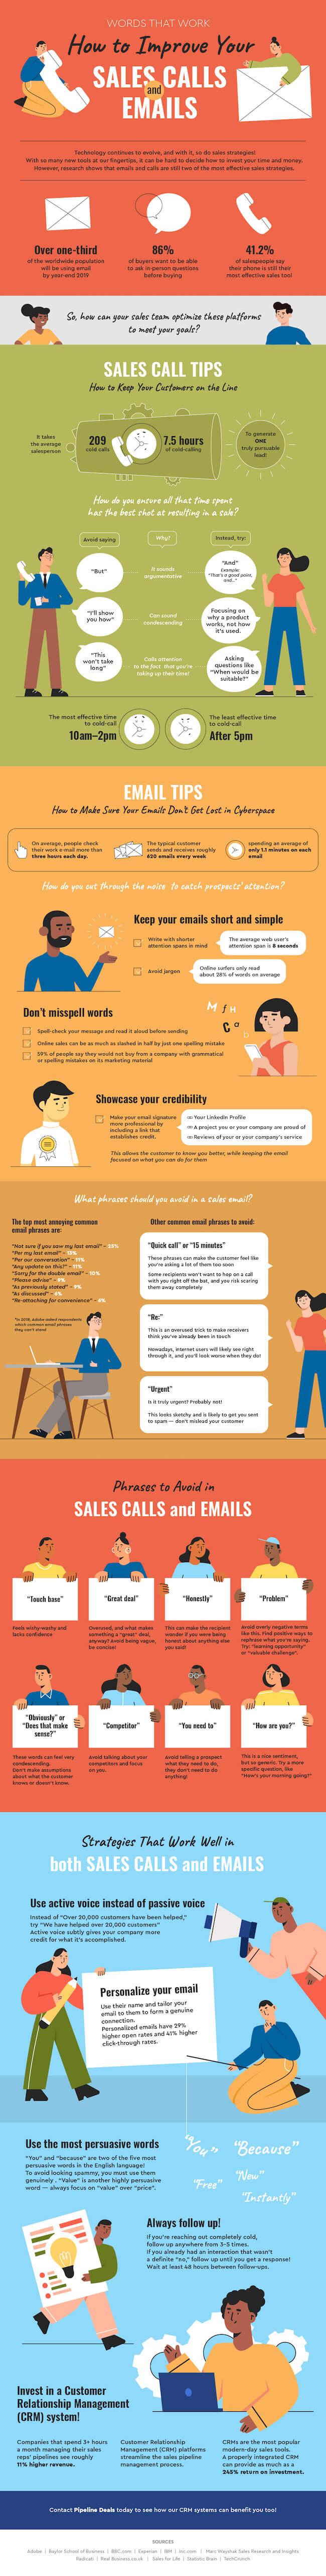 improve your side hustle